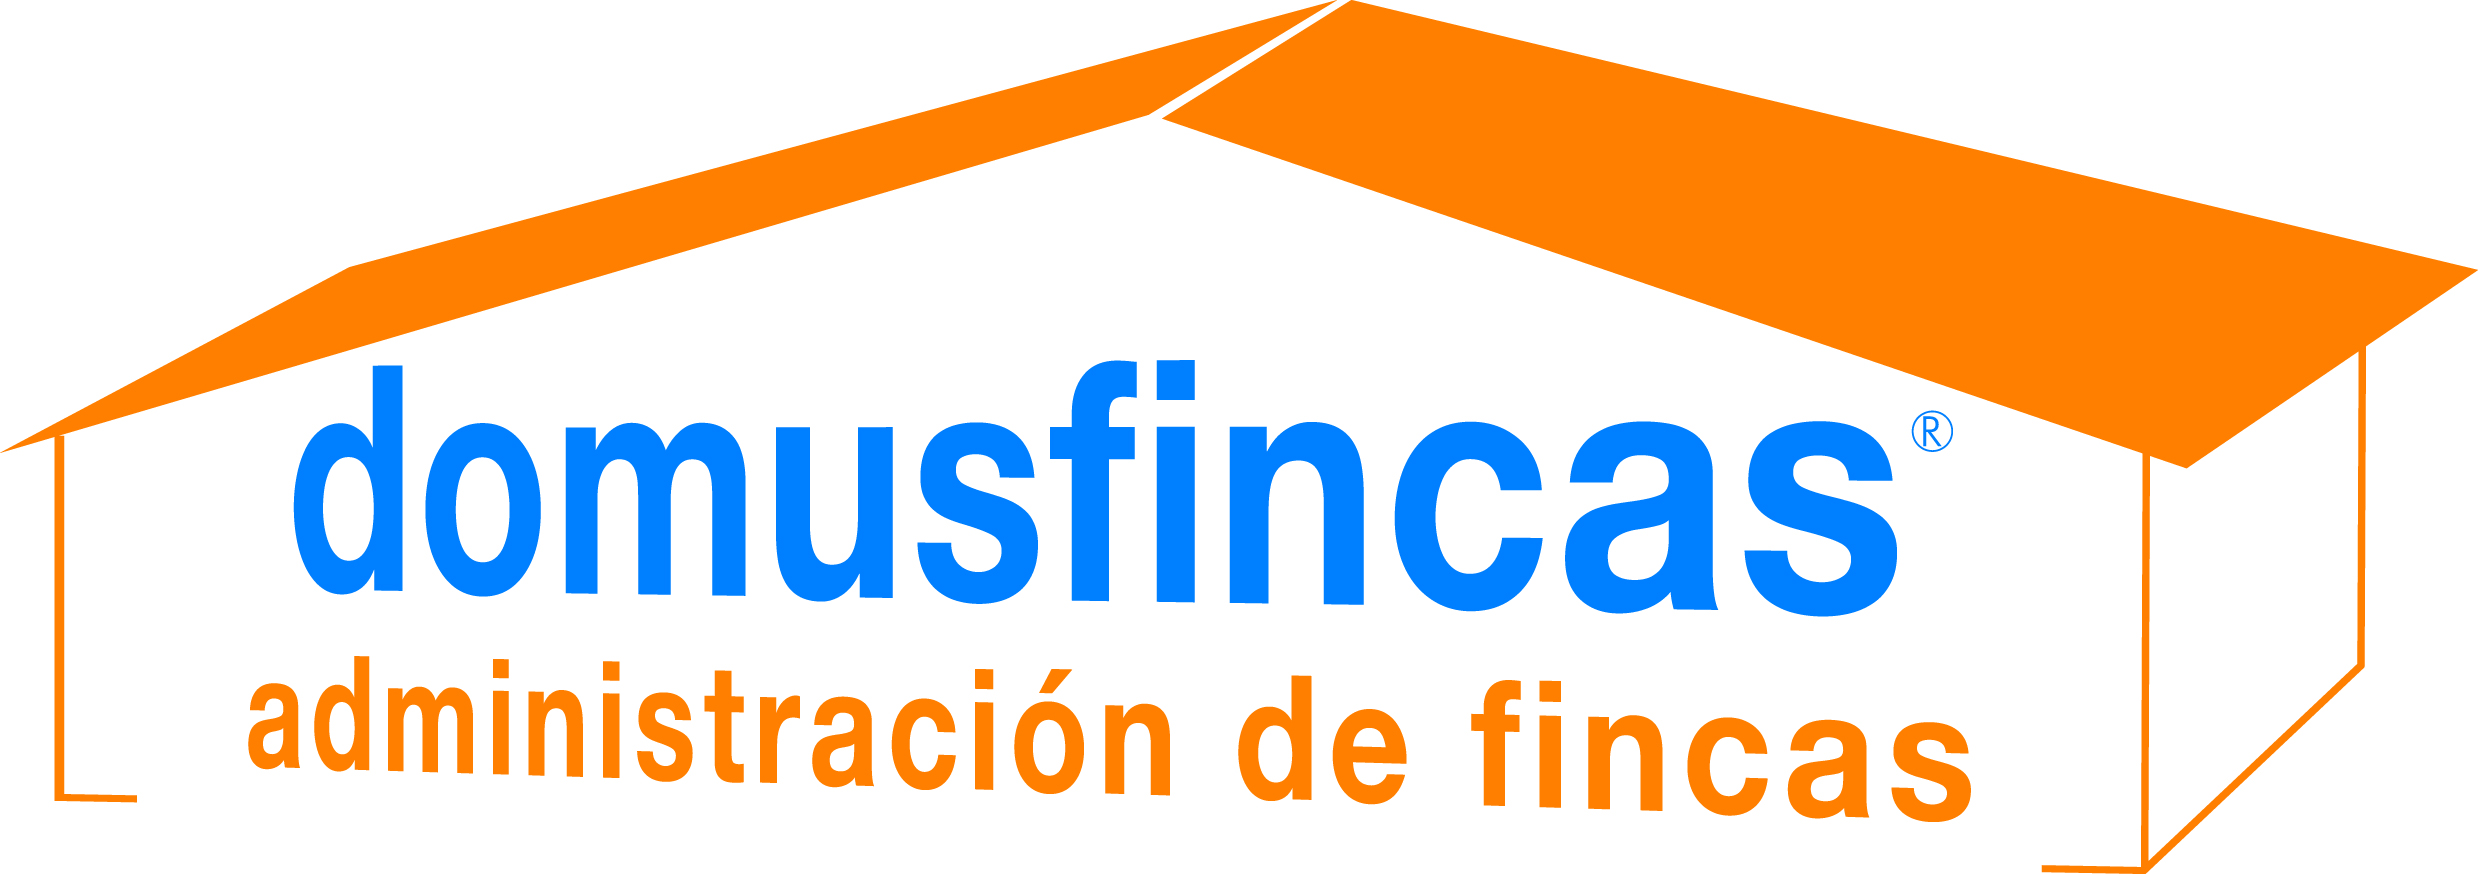 DOMUSFINCAS 2020 ©_Administradores de fincas en Madrid